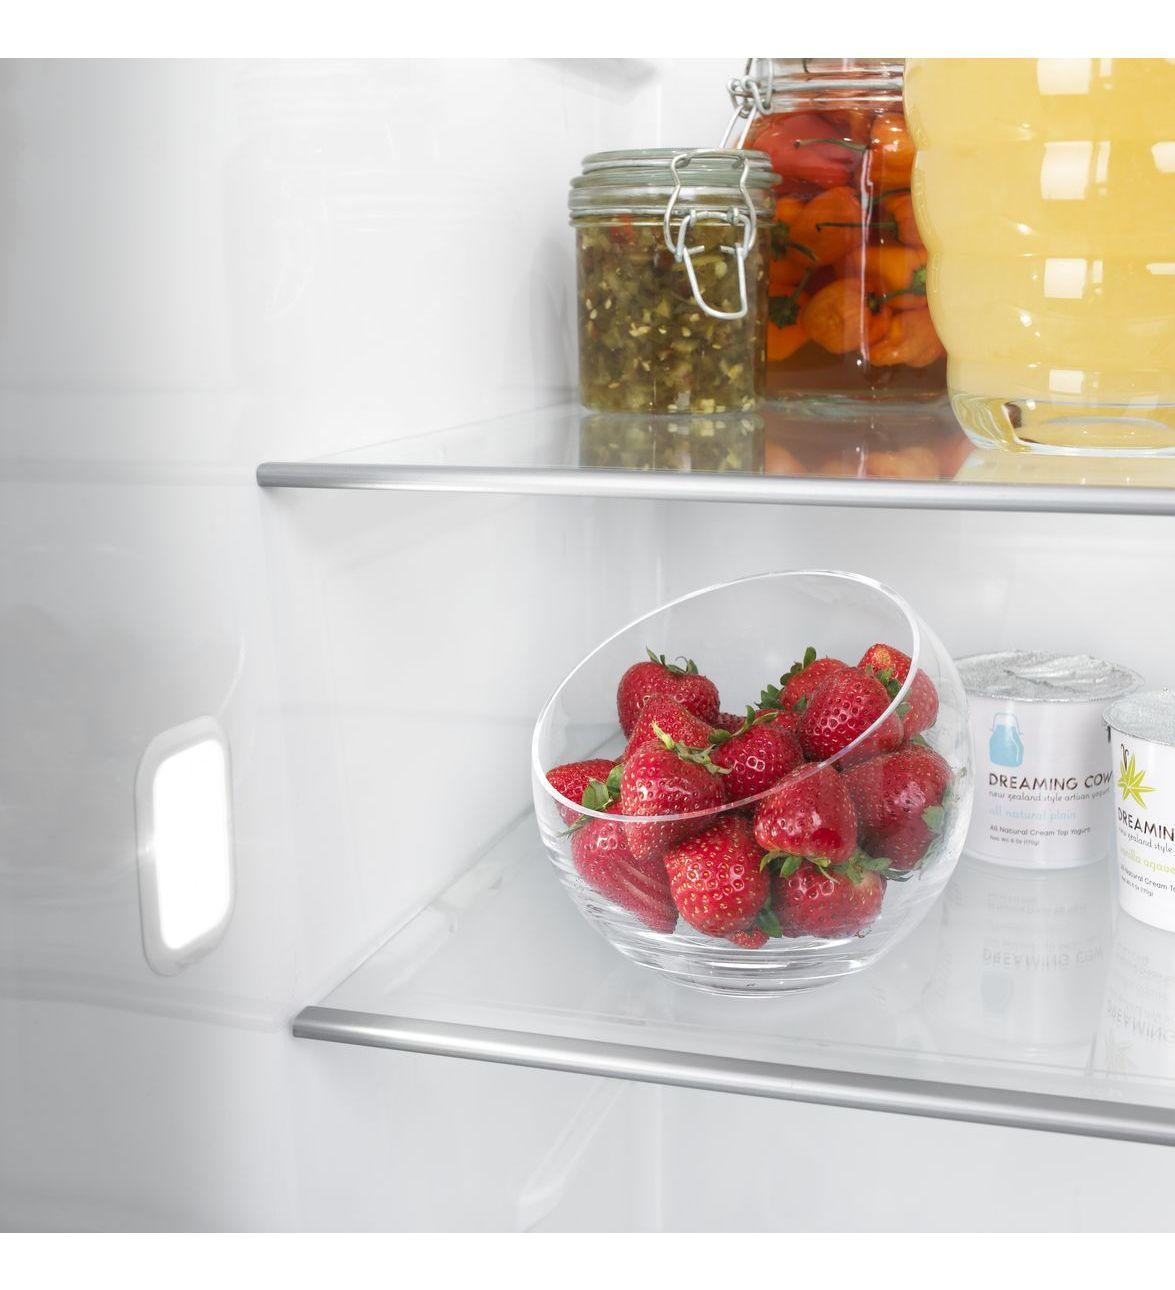 Wrs965ciam Whirlpool Wrs965ciam Side By Side Refrigerators